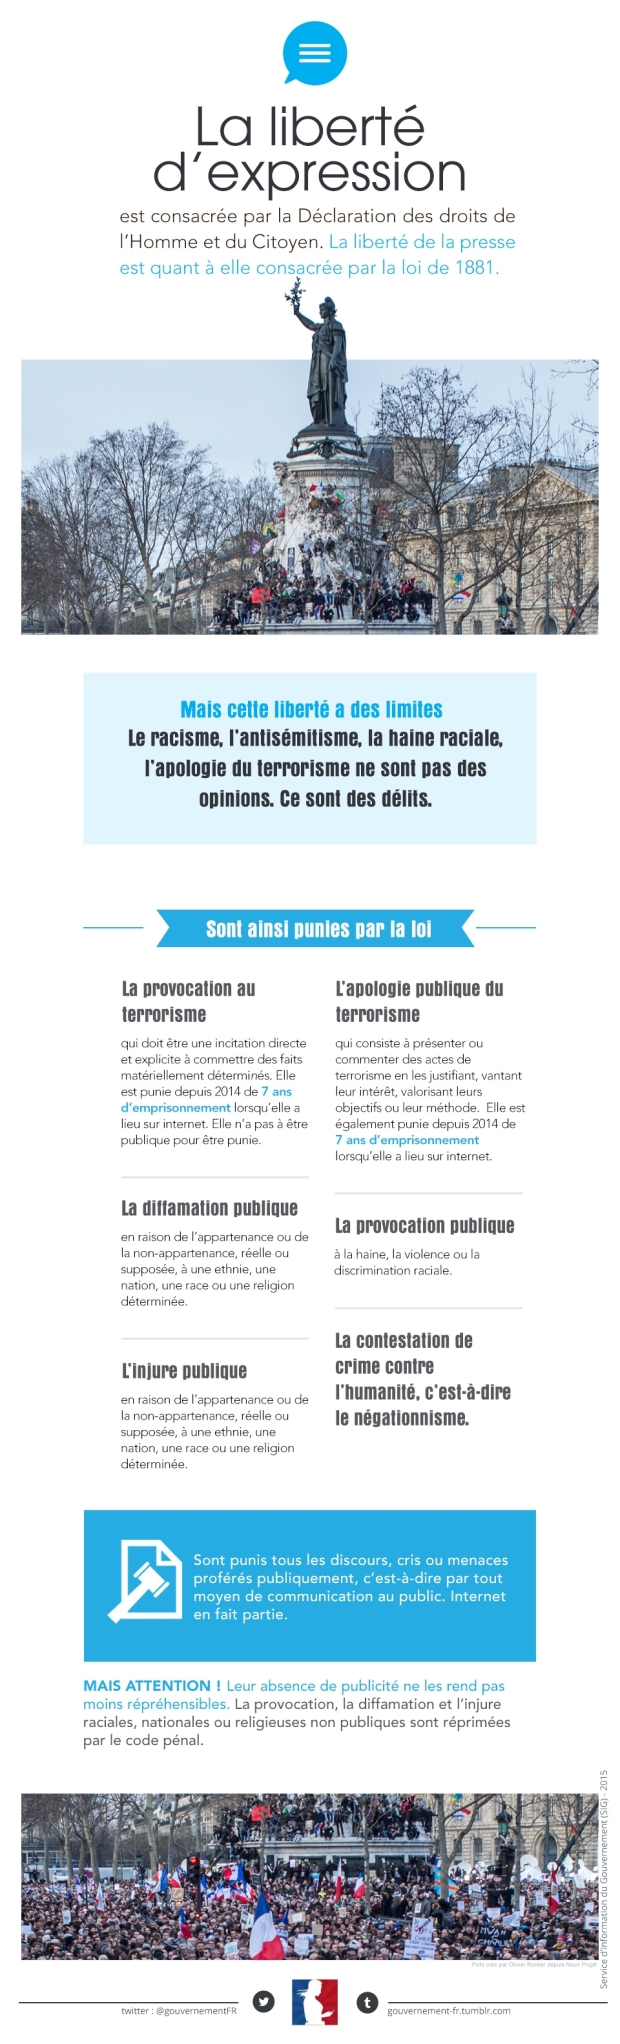 infog-liberte-expression-05